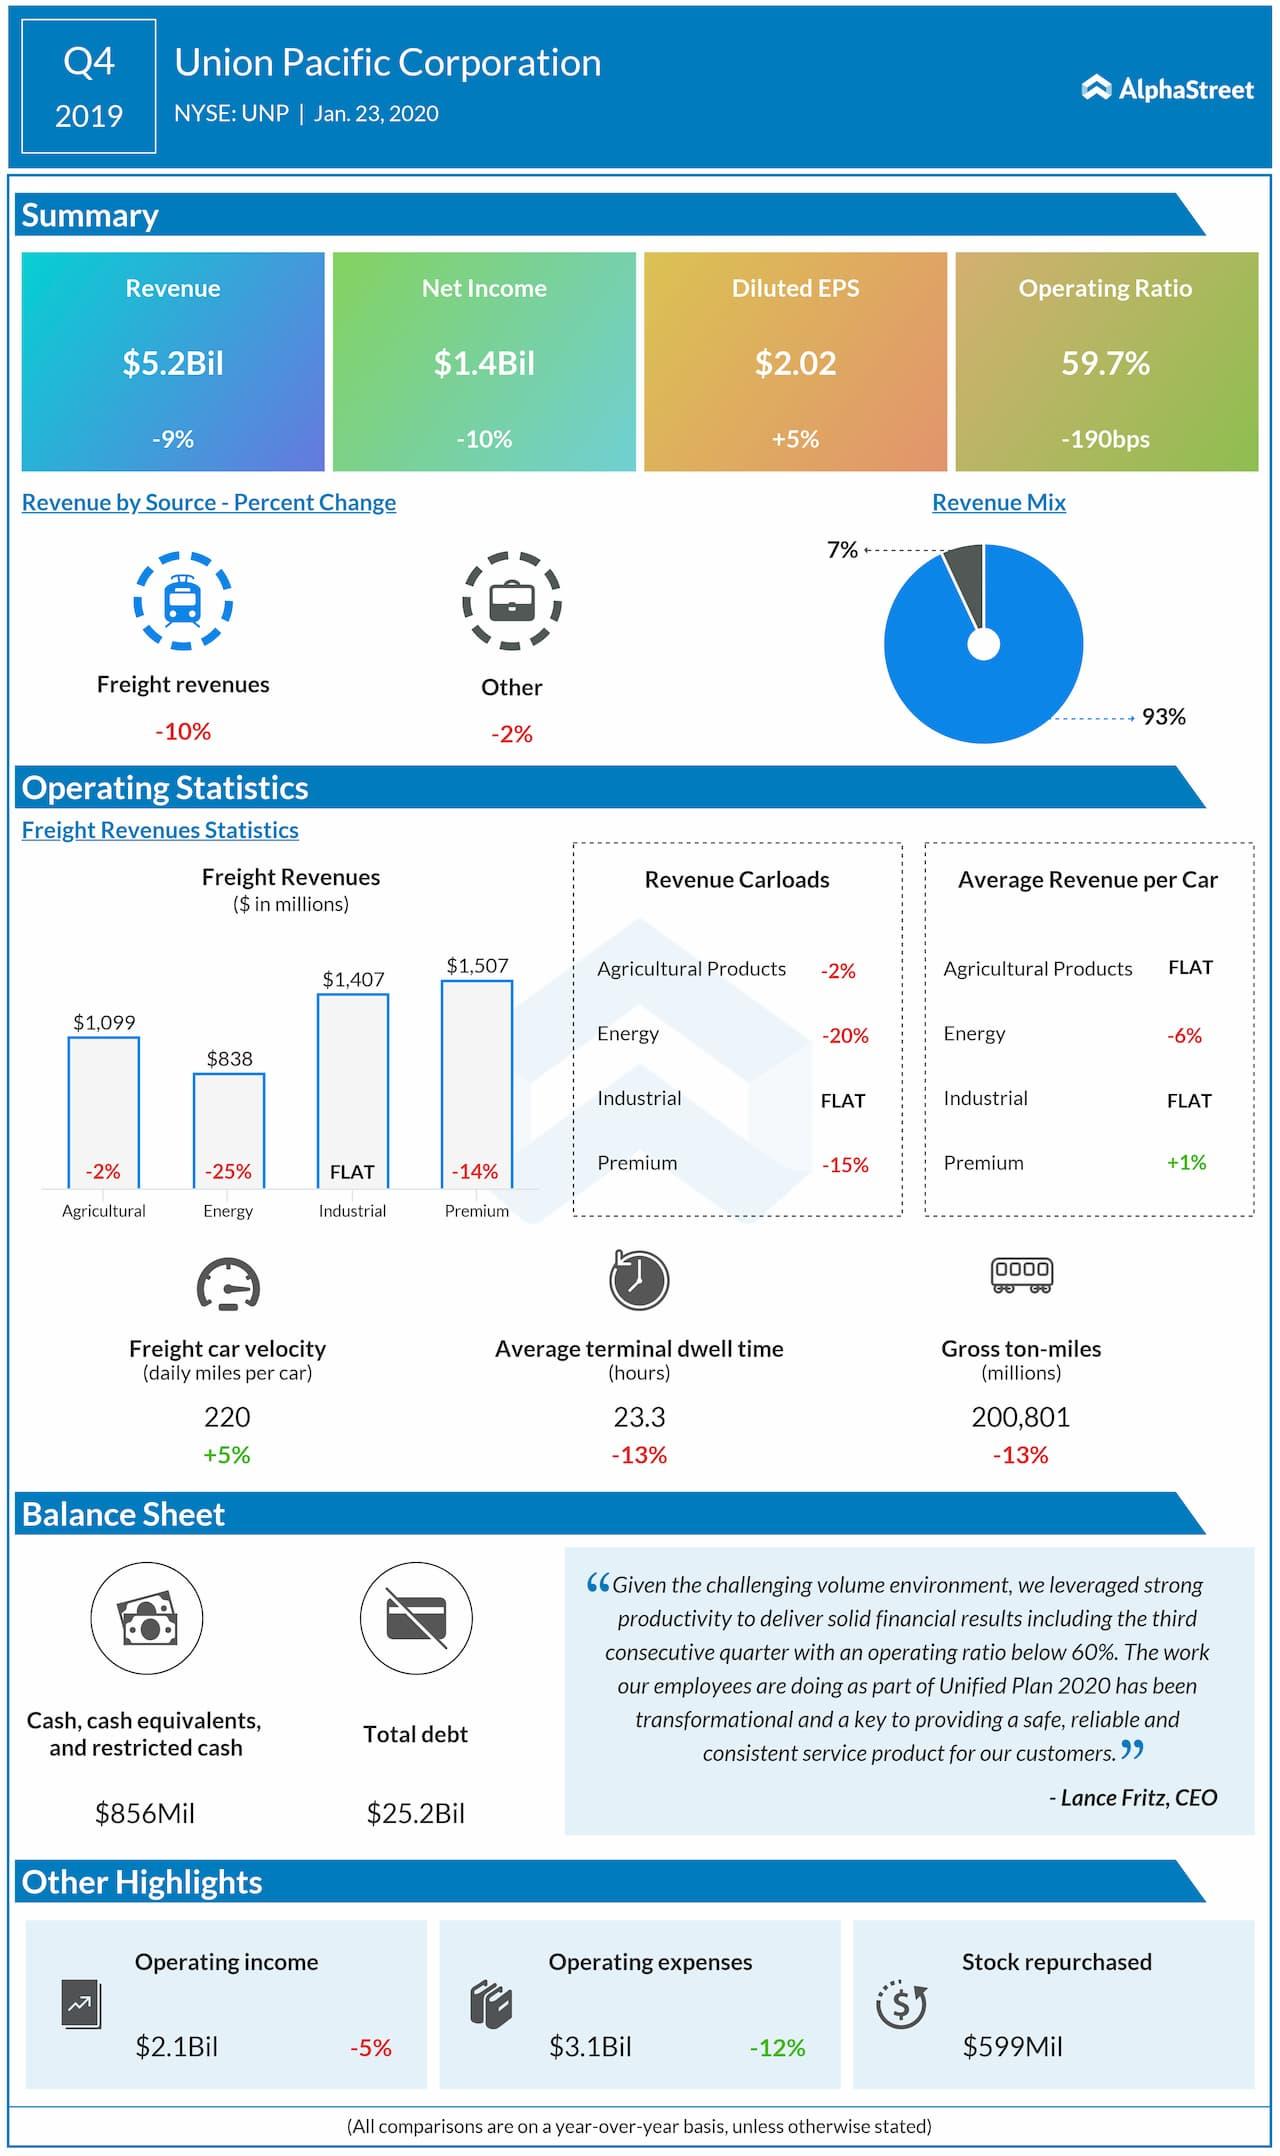 Union Pacific (UNP) Q4 2019 Earnings Snapshot